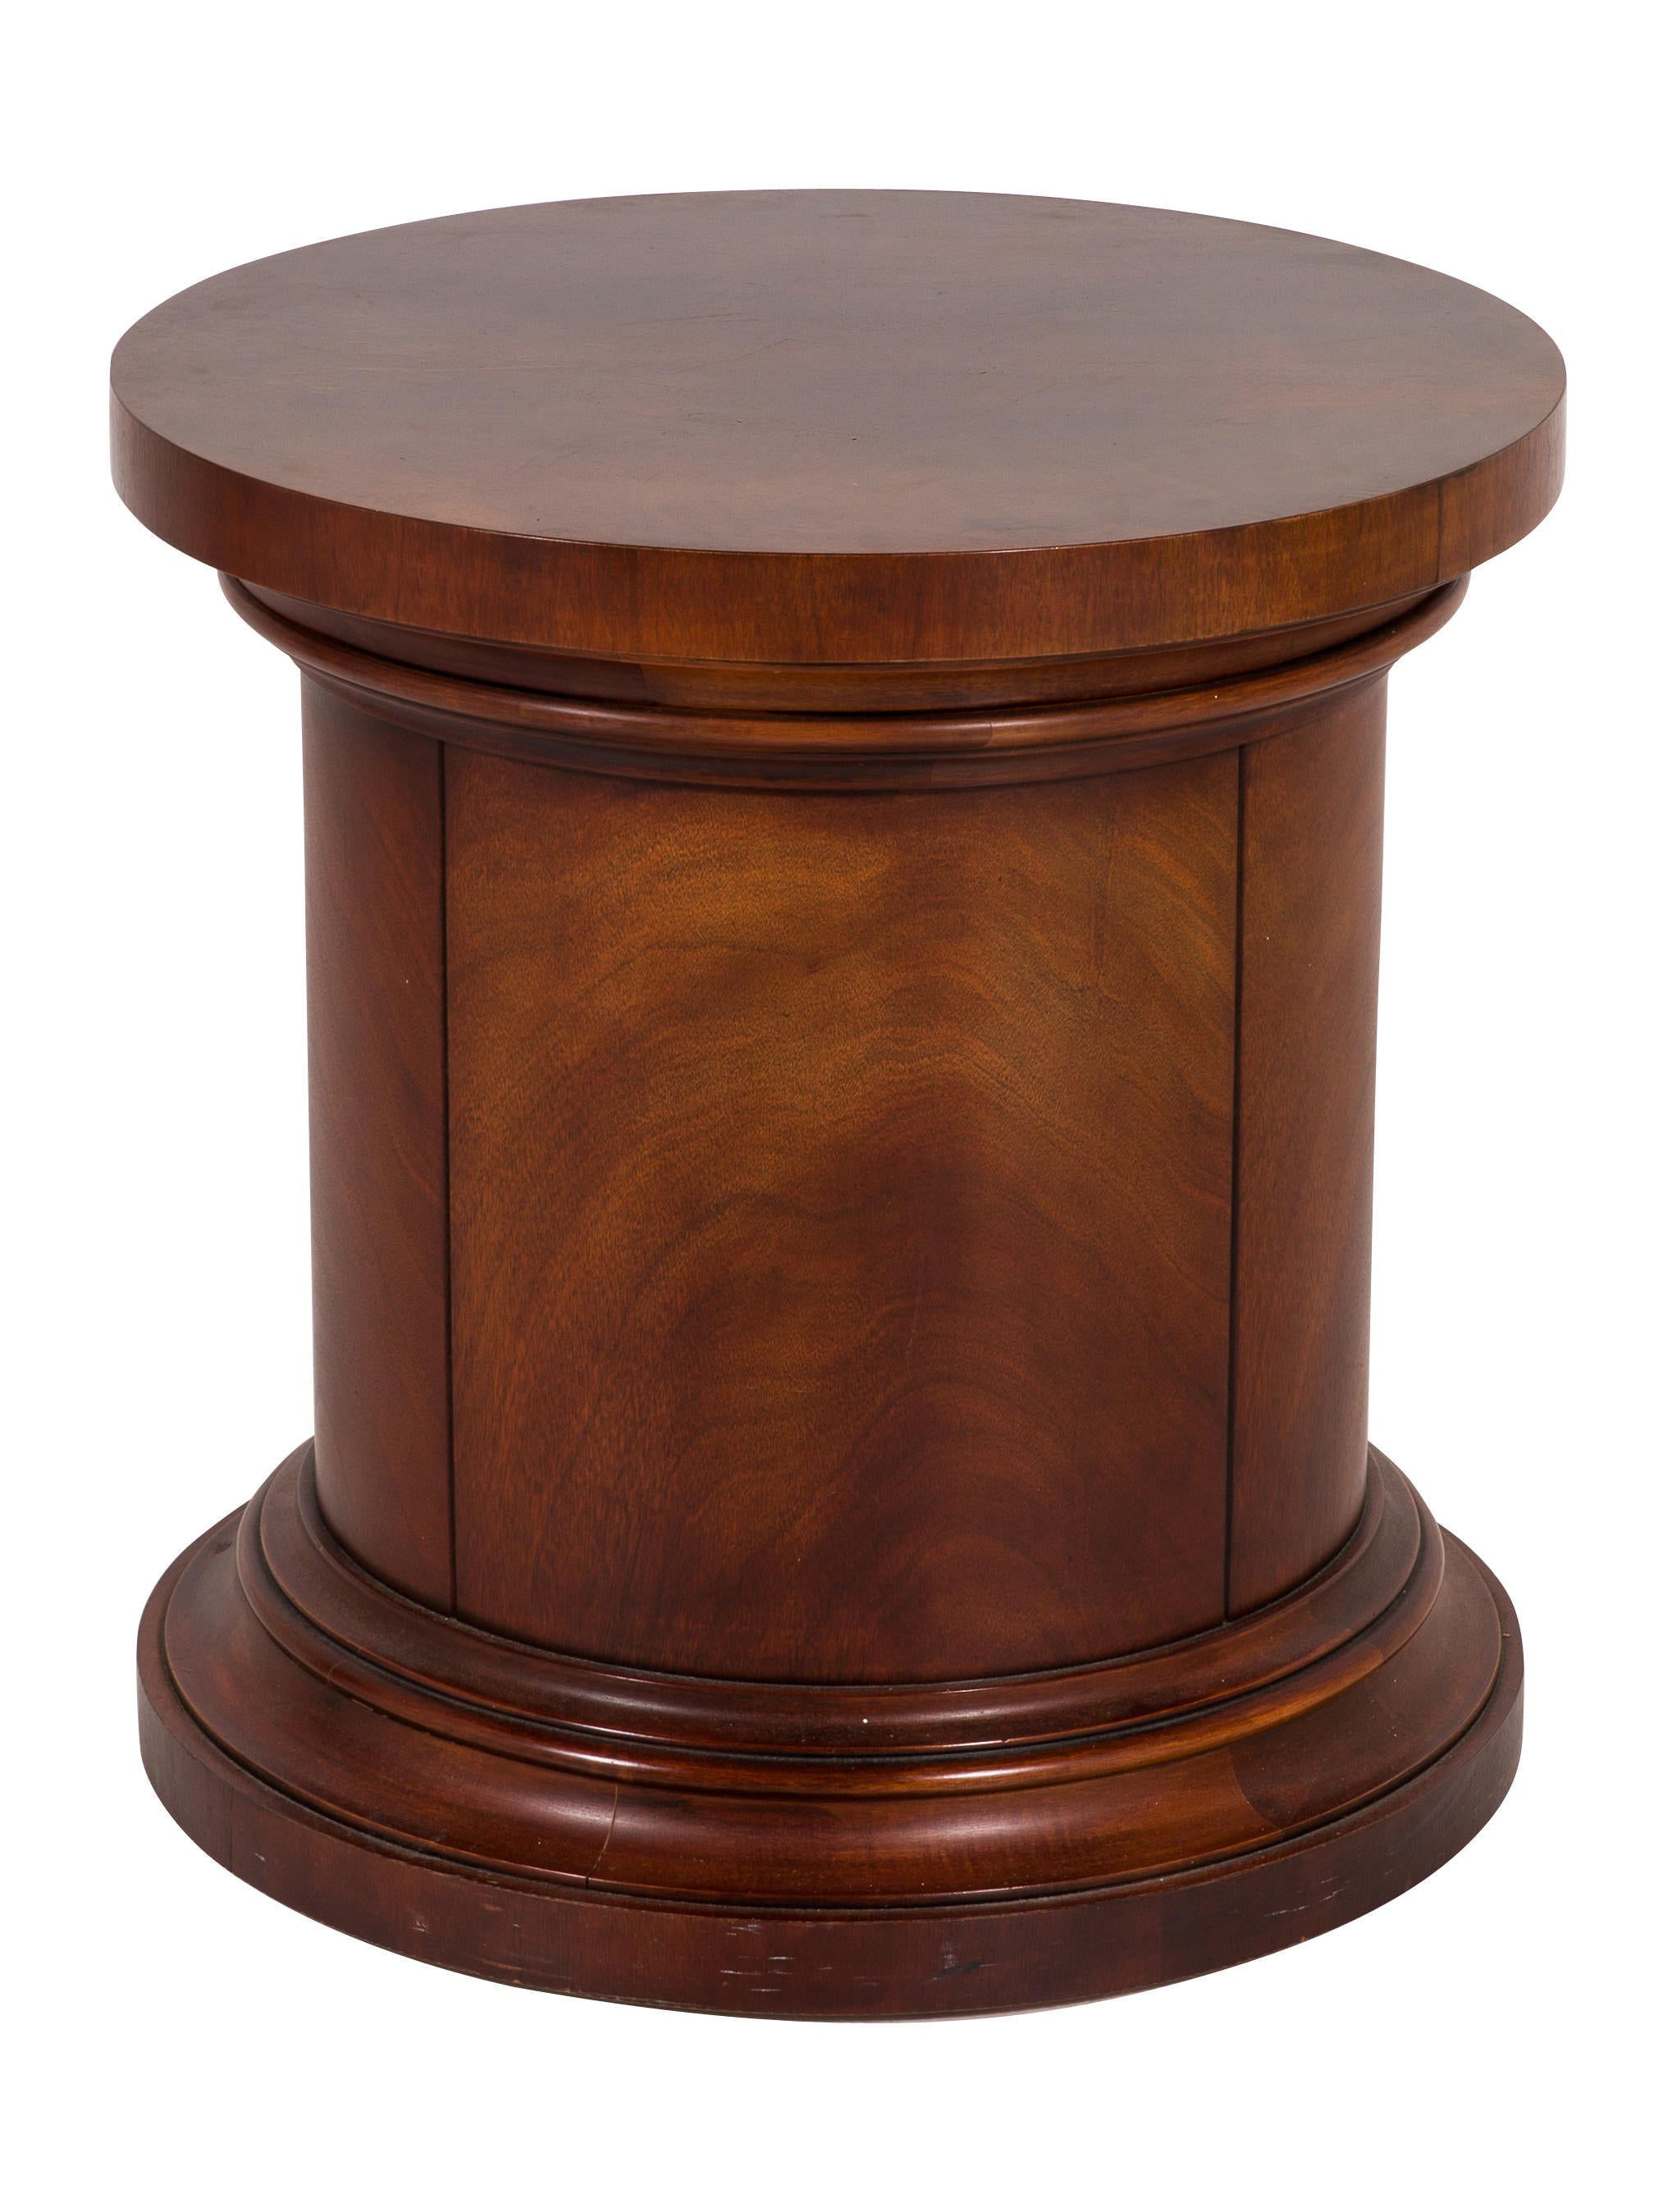 Polo ralph lauren cylindrical nightstand furniture for Ralph lauren outdoor furniture